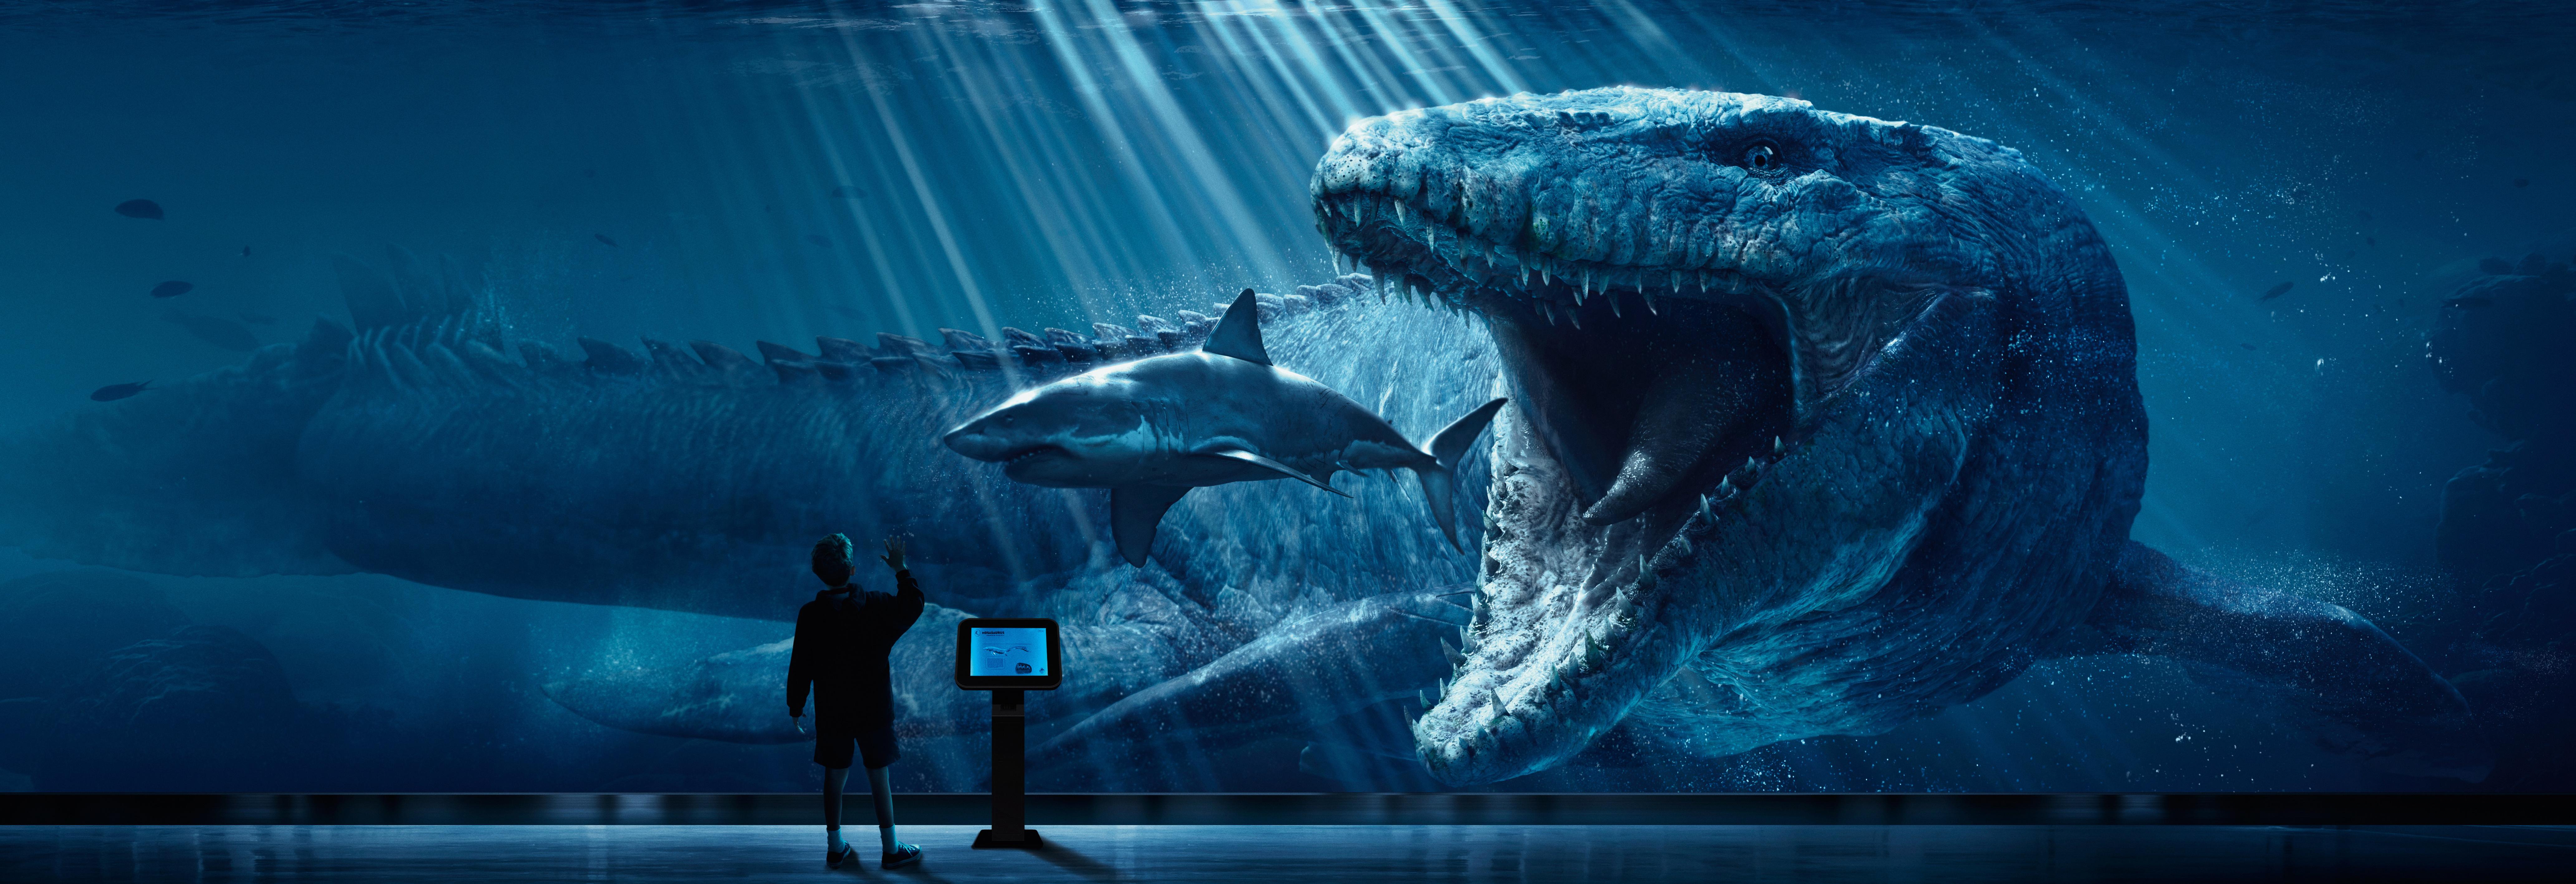 General 8261x2835 digital art Jurassic World shark dinosaurs Jurassic Park prehistoric fish animals artwork render CGI children